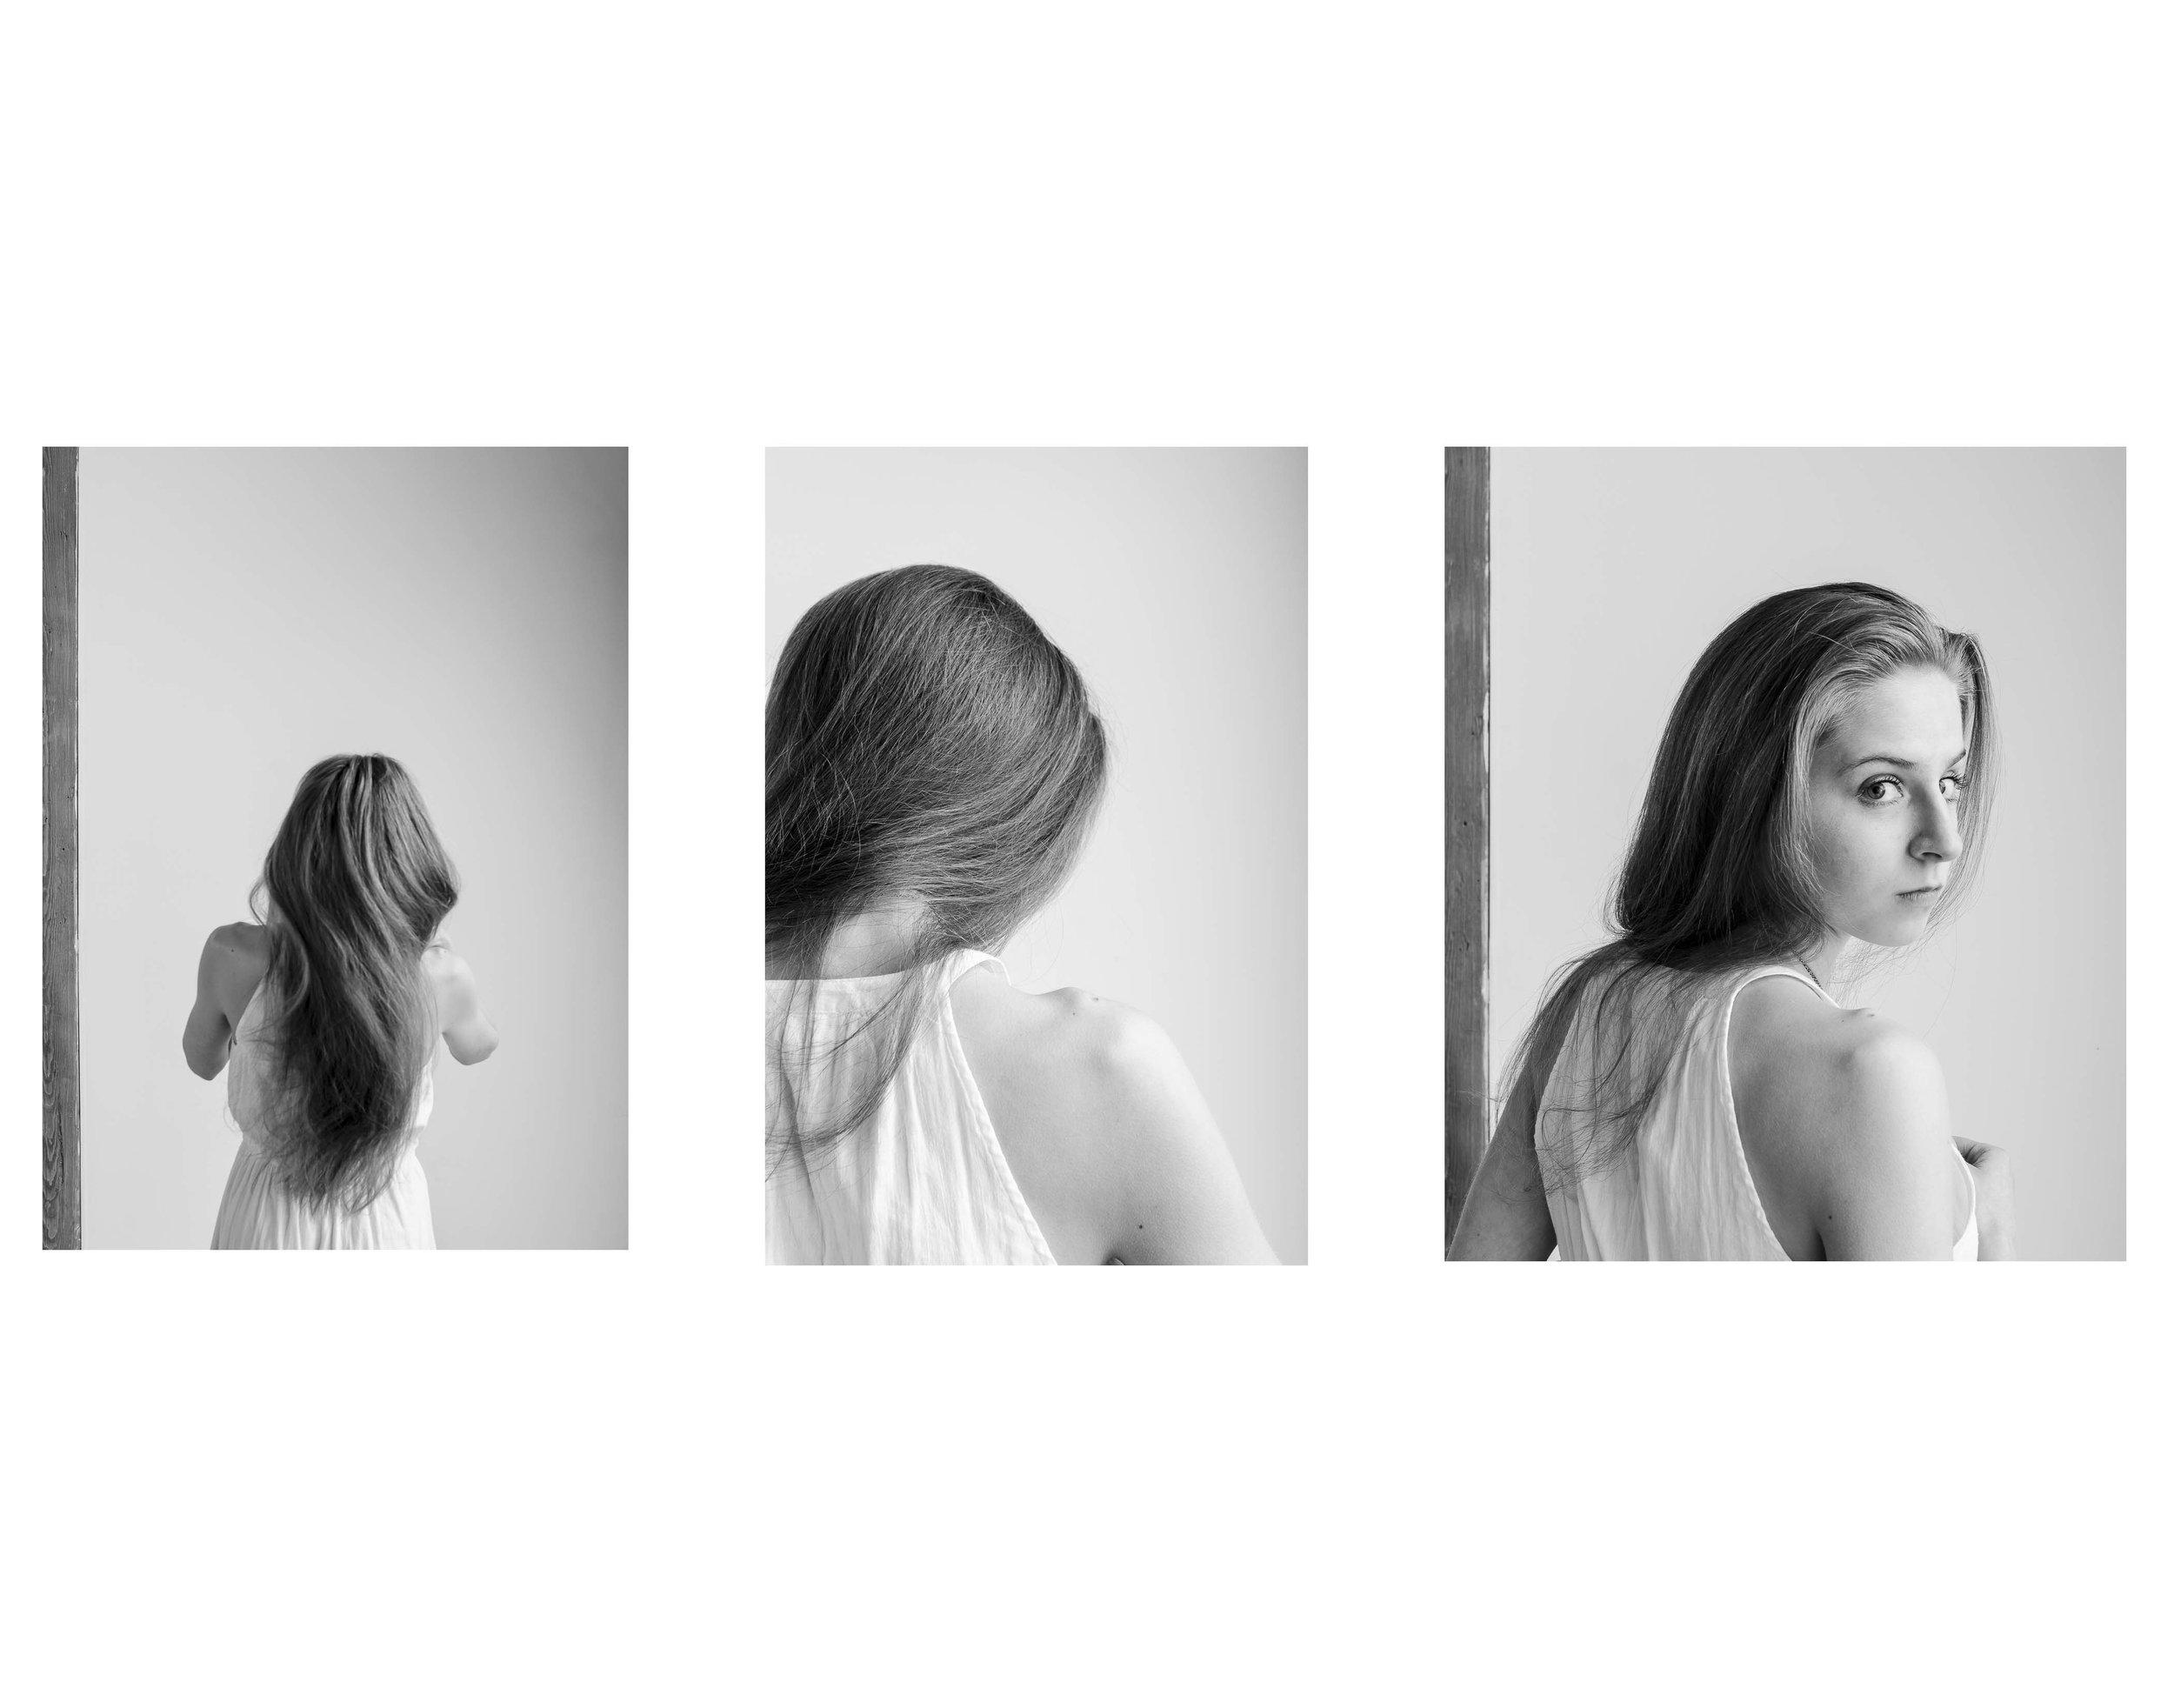 portraits_3.JPG